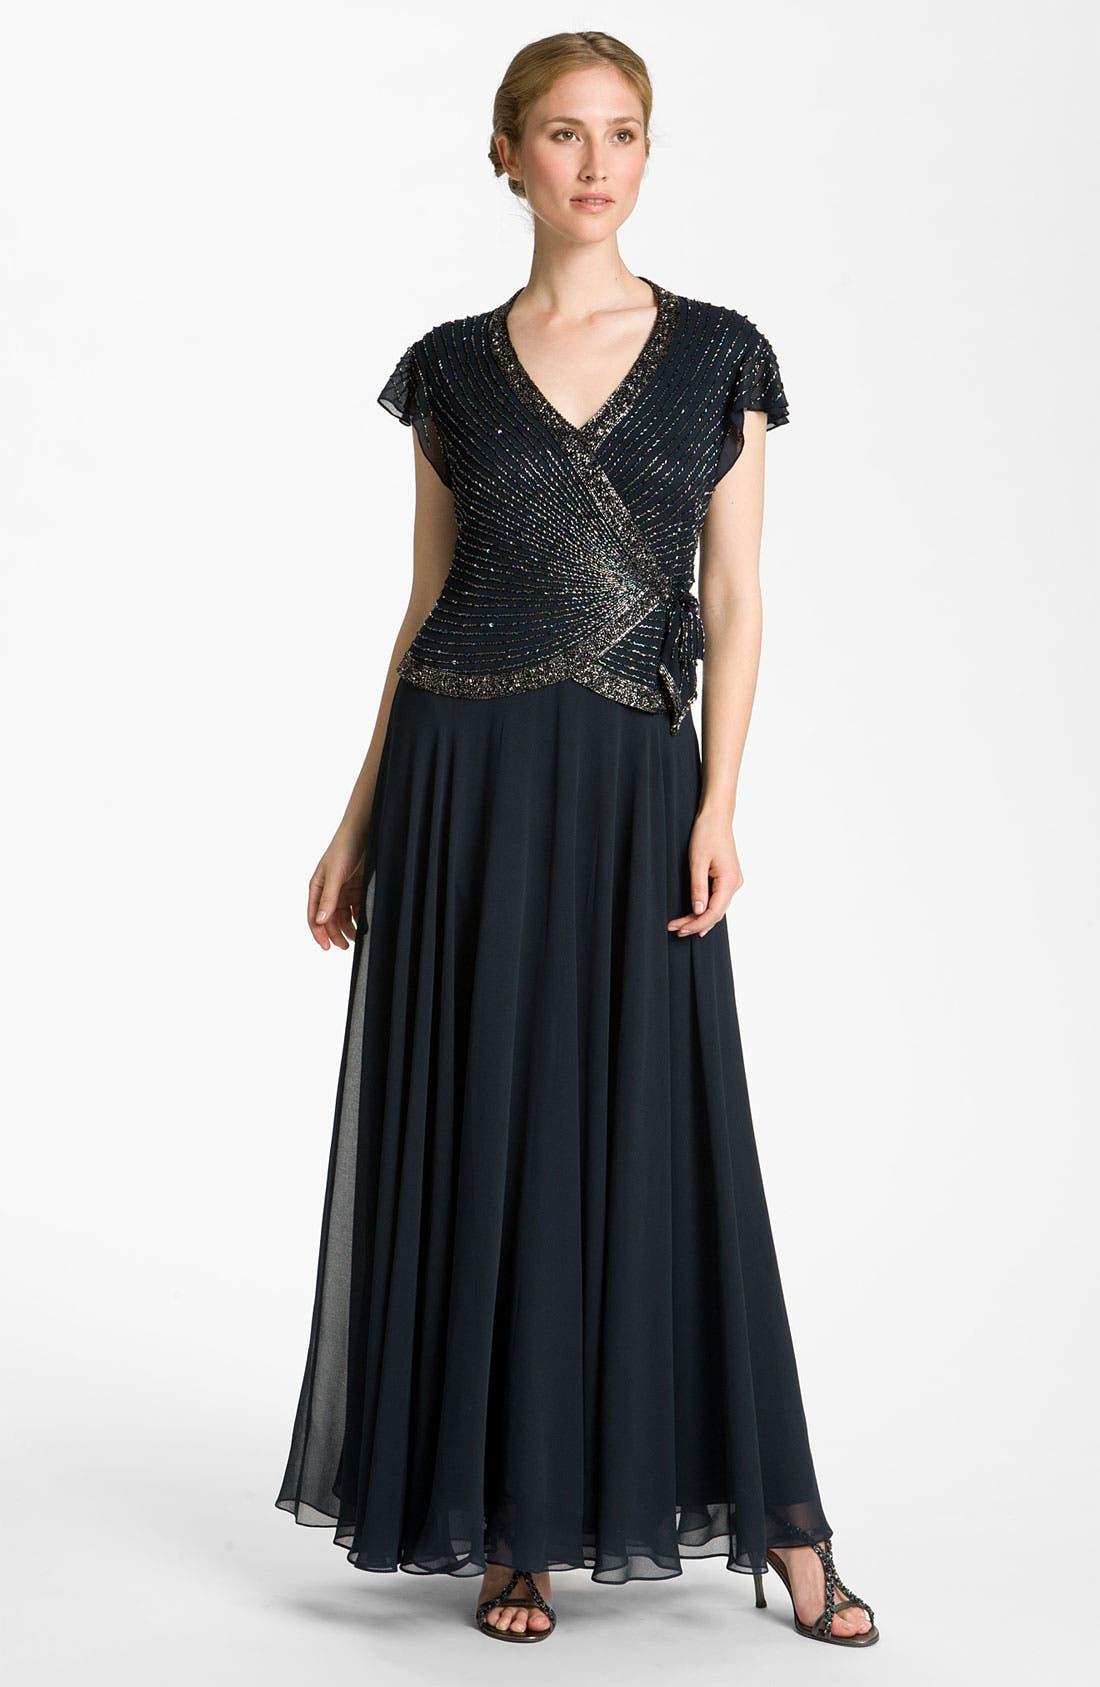 Alternate Image 1 Selected - J Kara Embellished Chiffon Gown